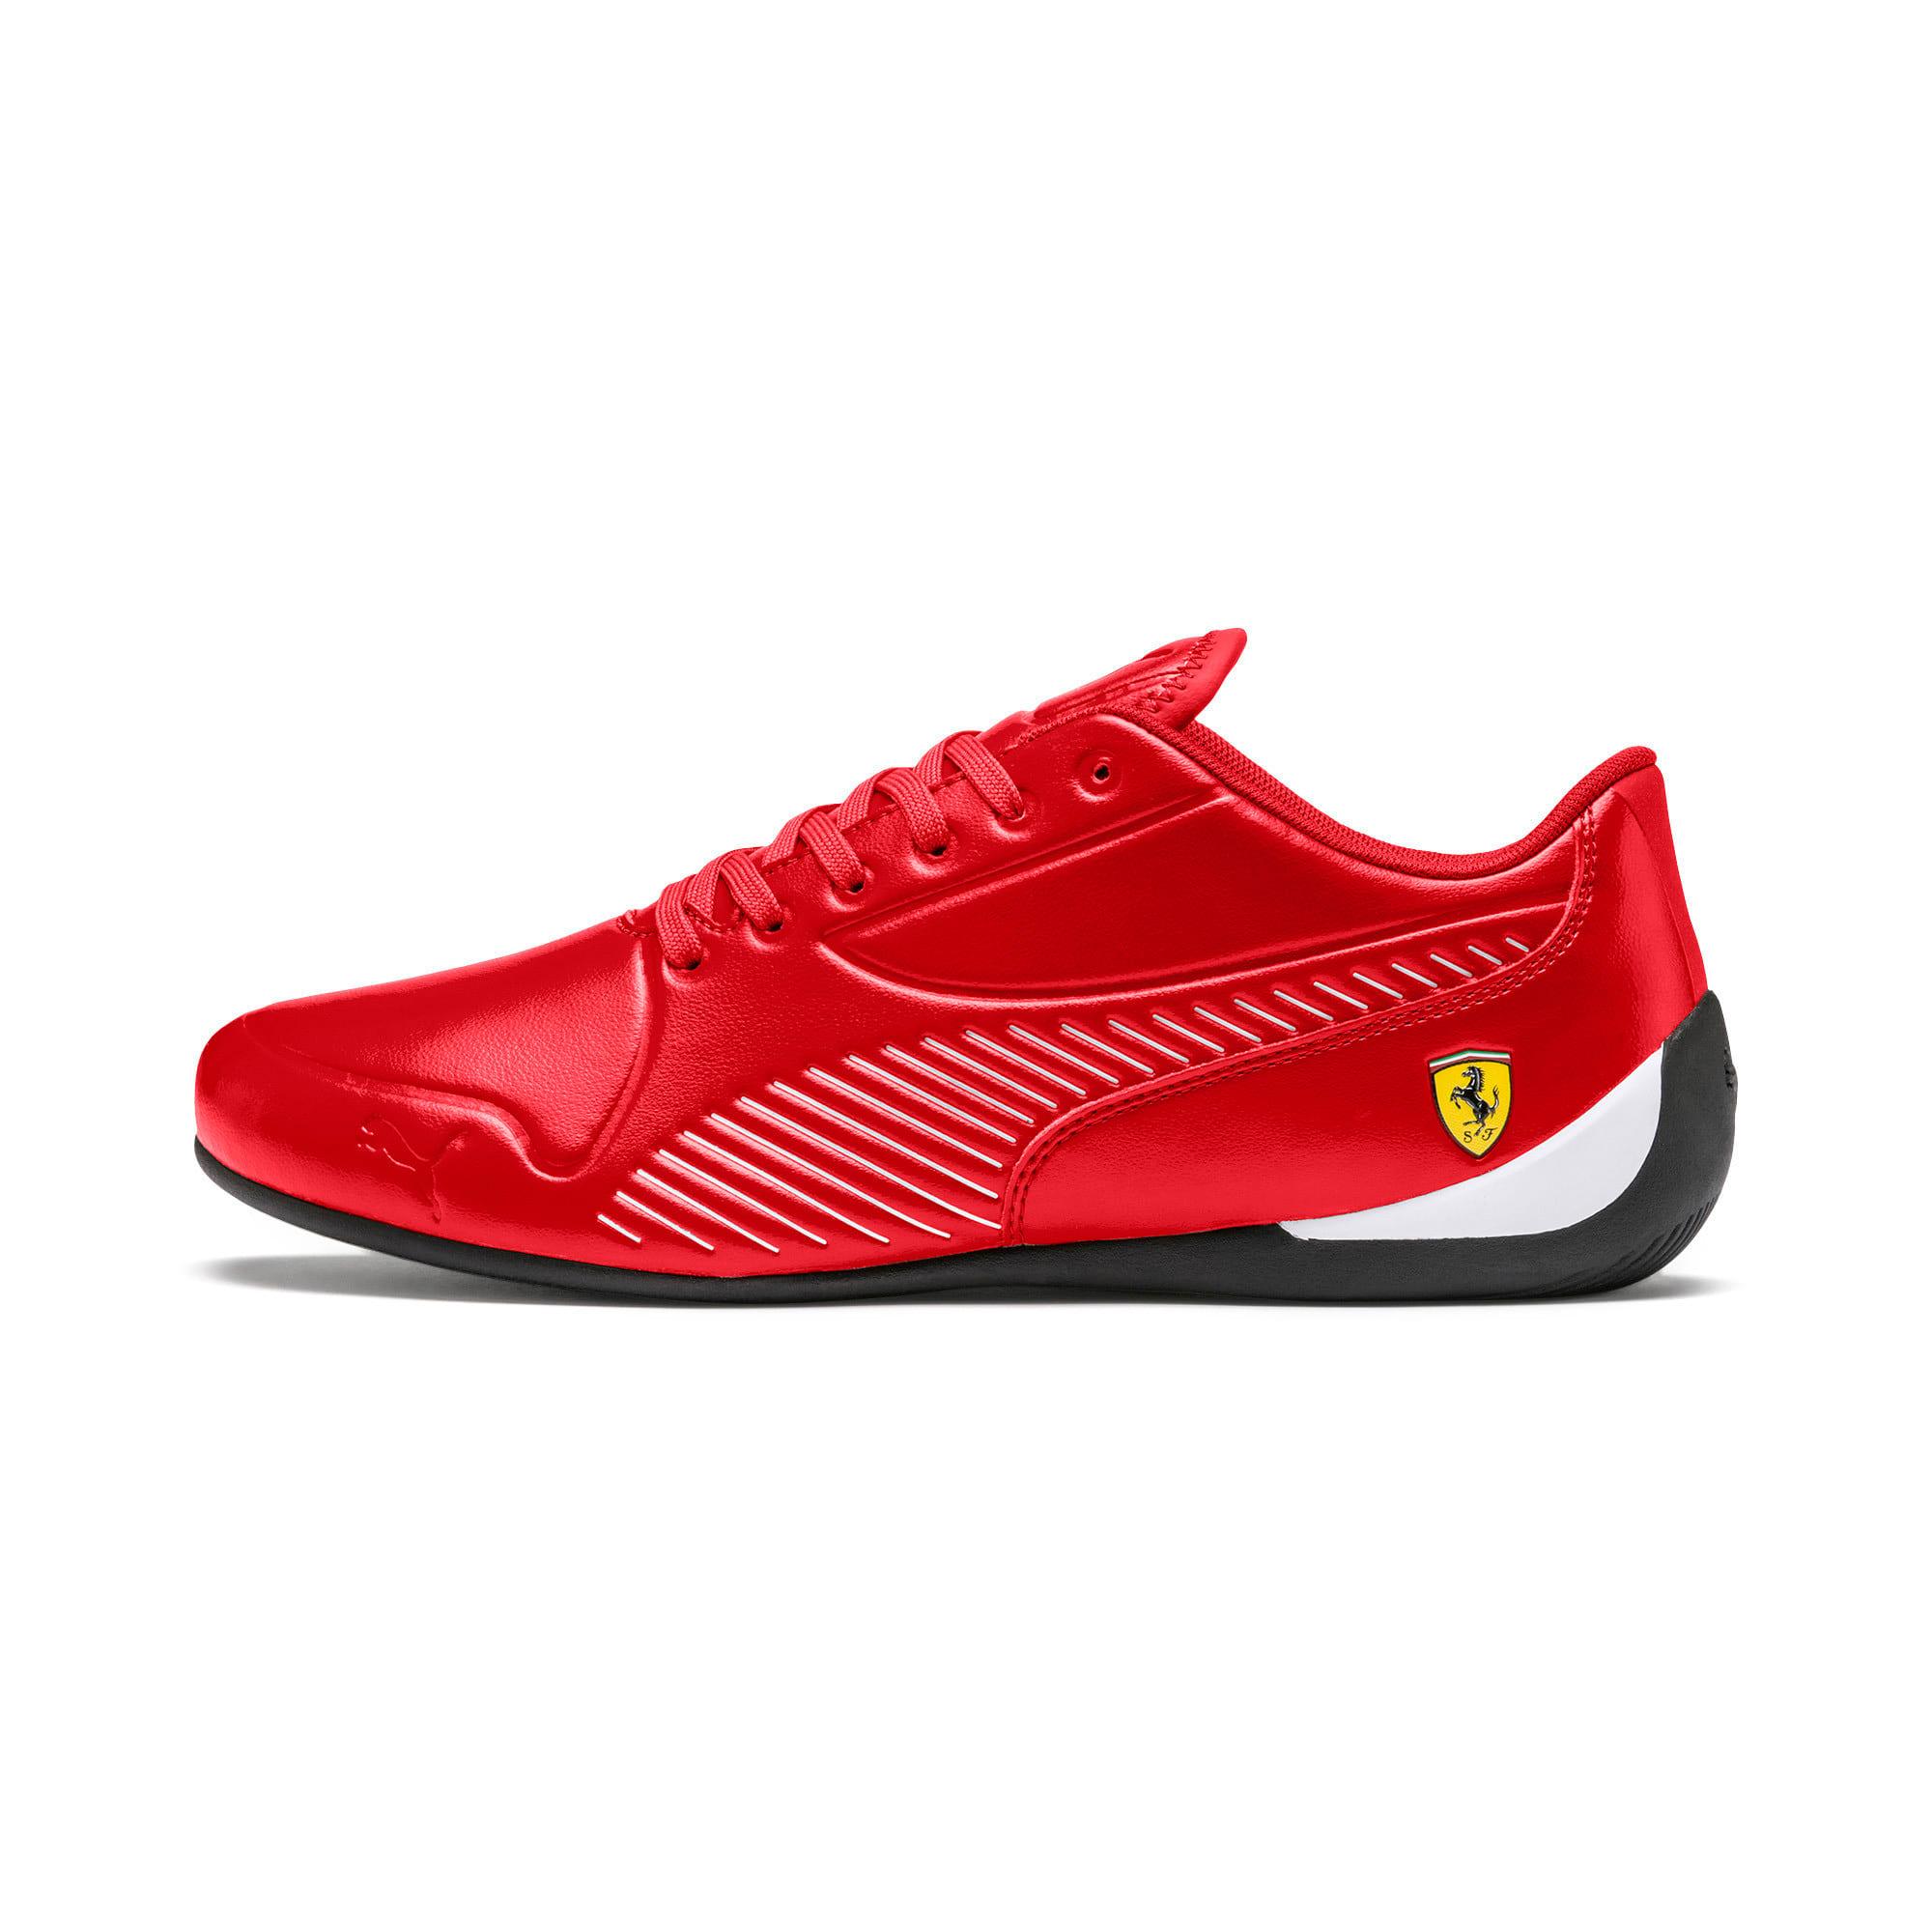 Thumbnail 1 of Ferrari Drift Cat 7S Ultra Men's Trainers, Rosso Corsa-Puma White, medium-IND